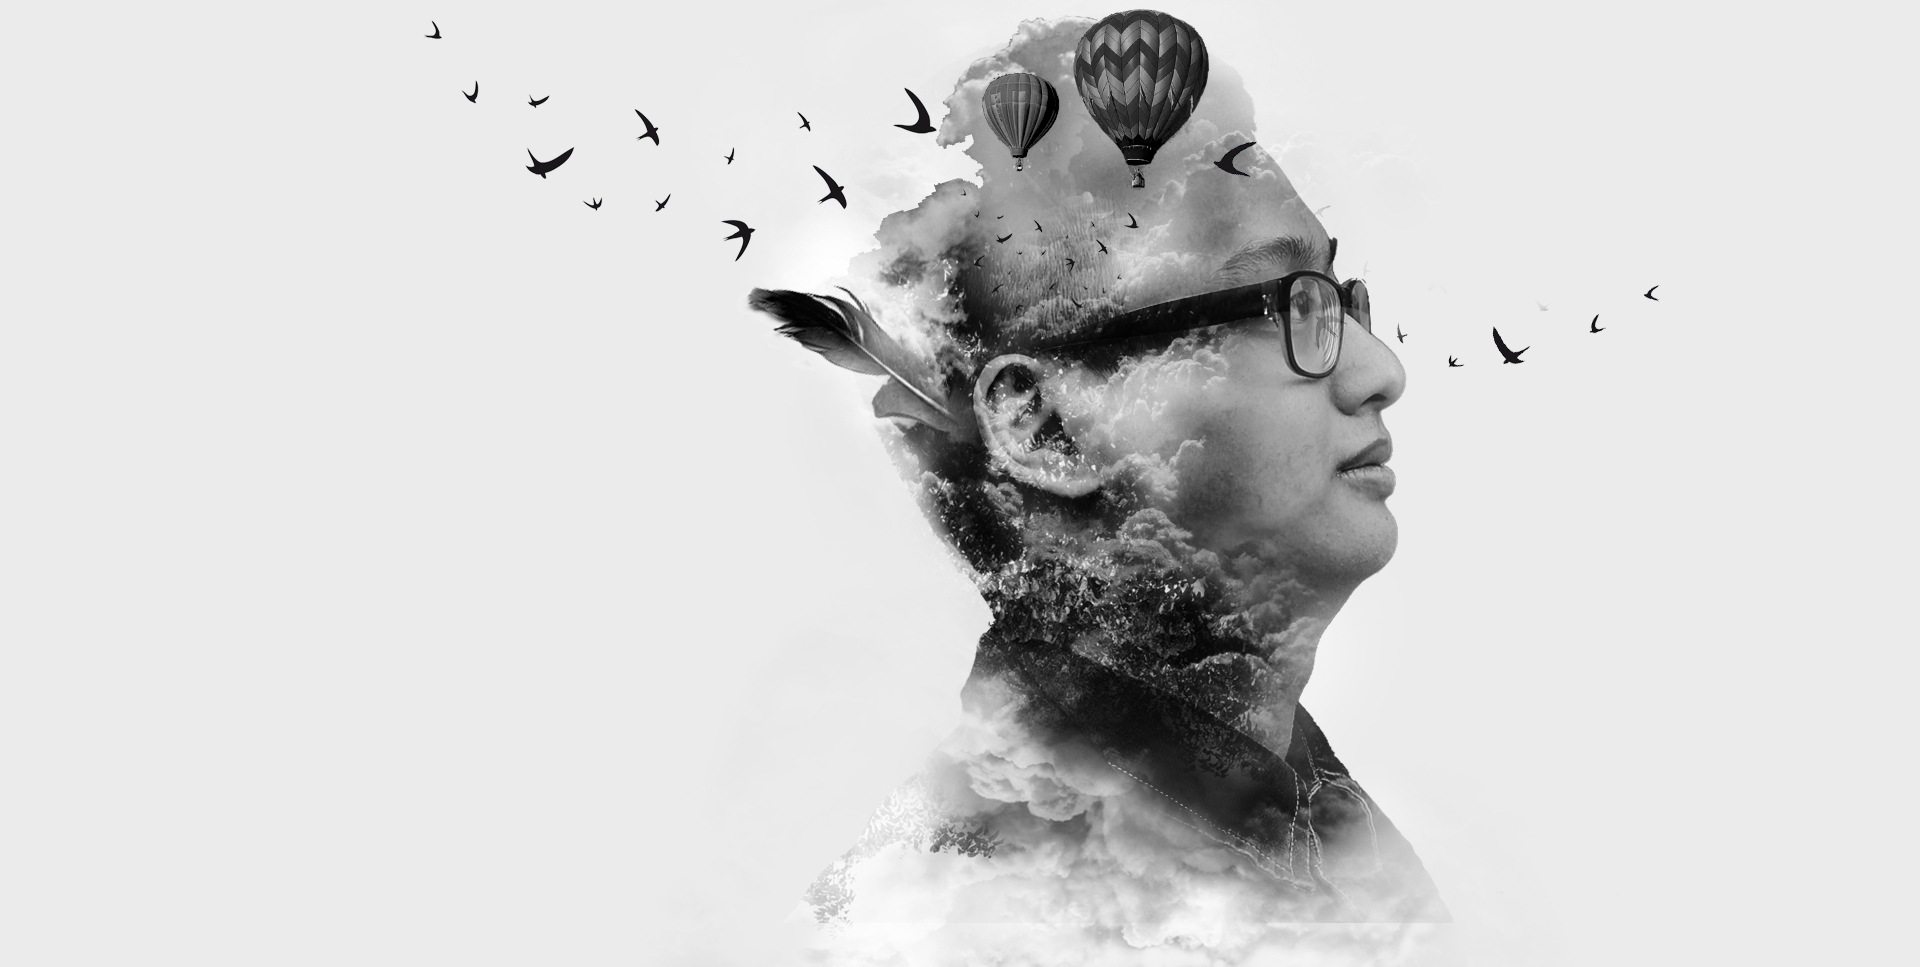 Self Potrait by Arlen Augusto Chan